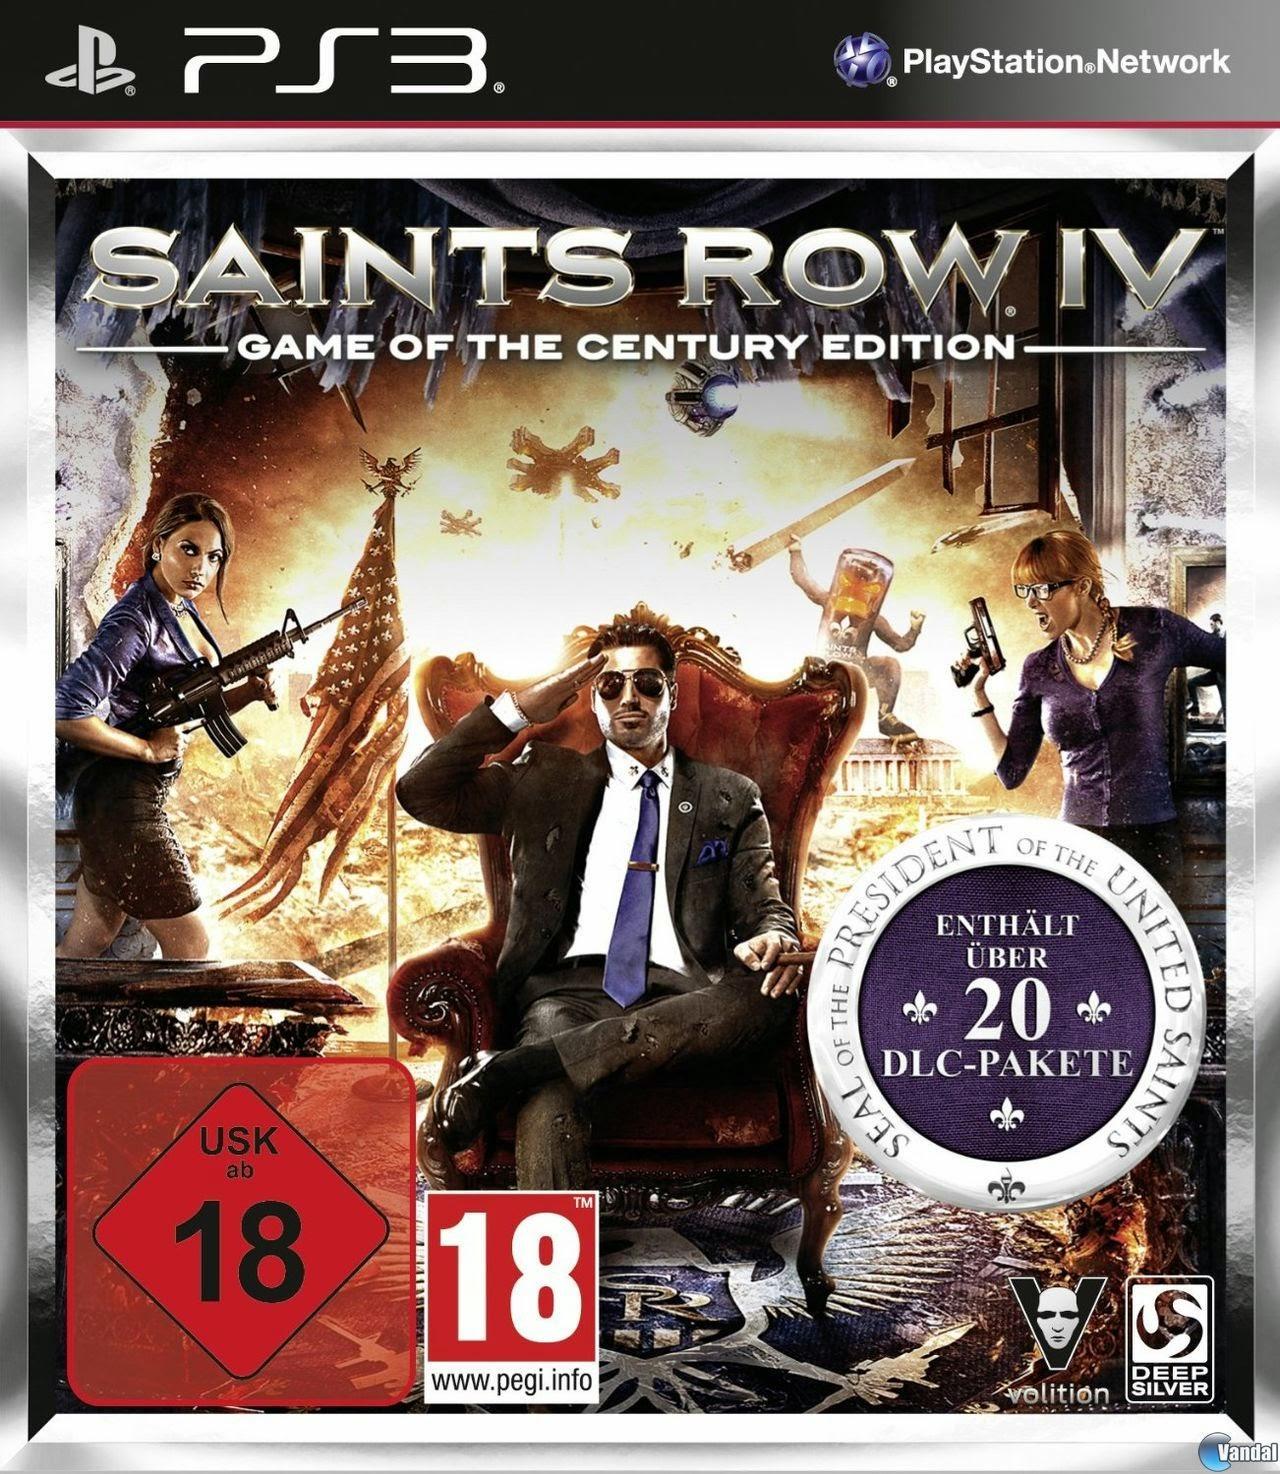 Saints Row IV PS3 free download